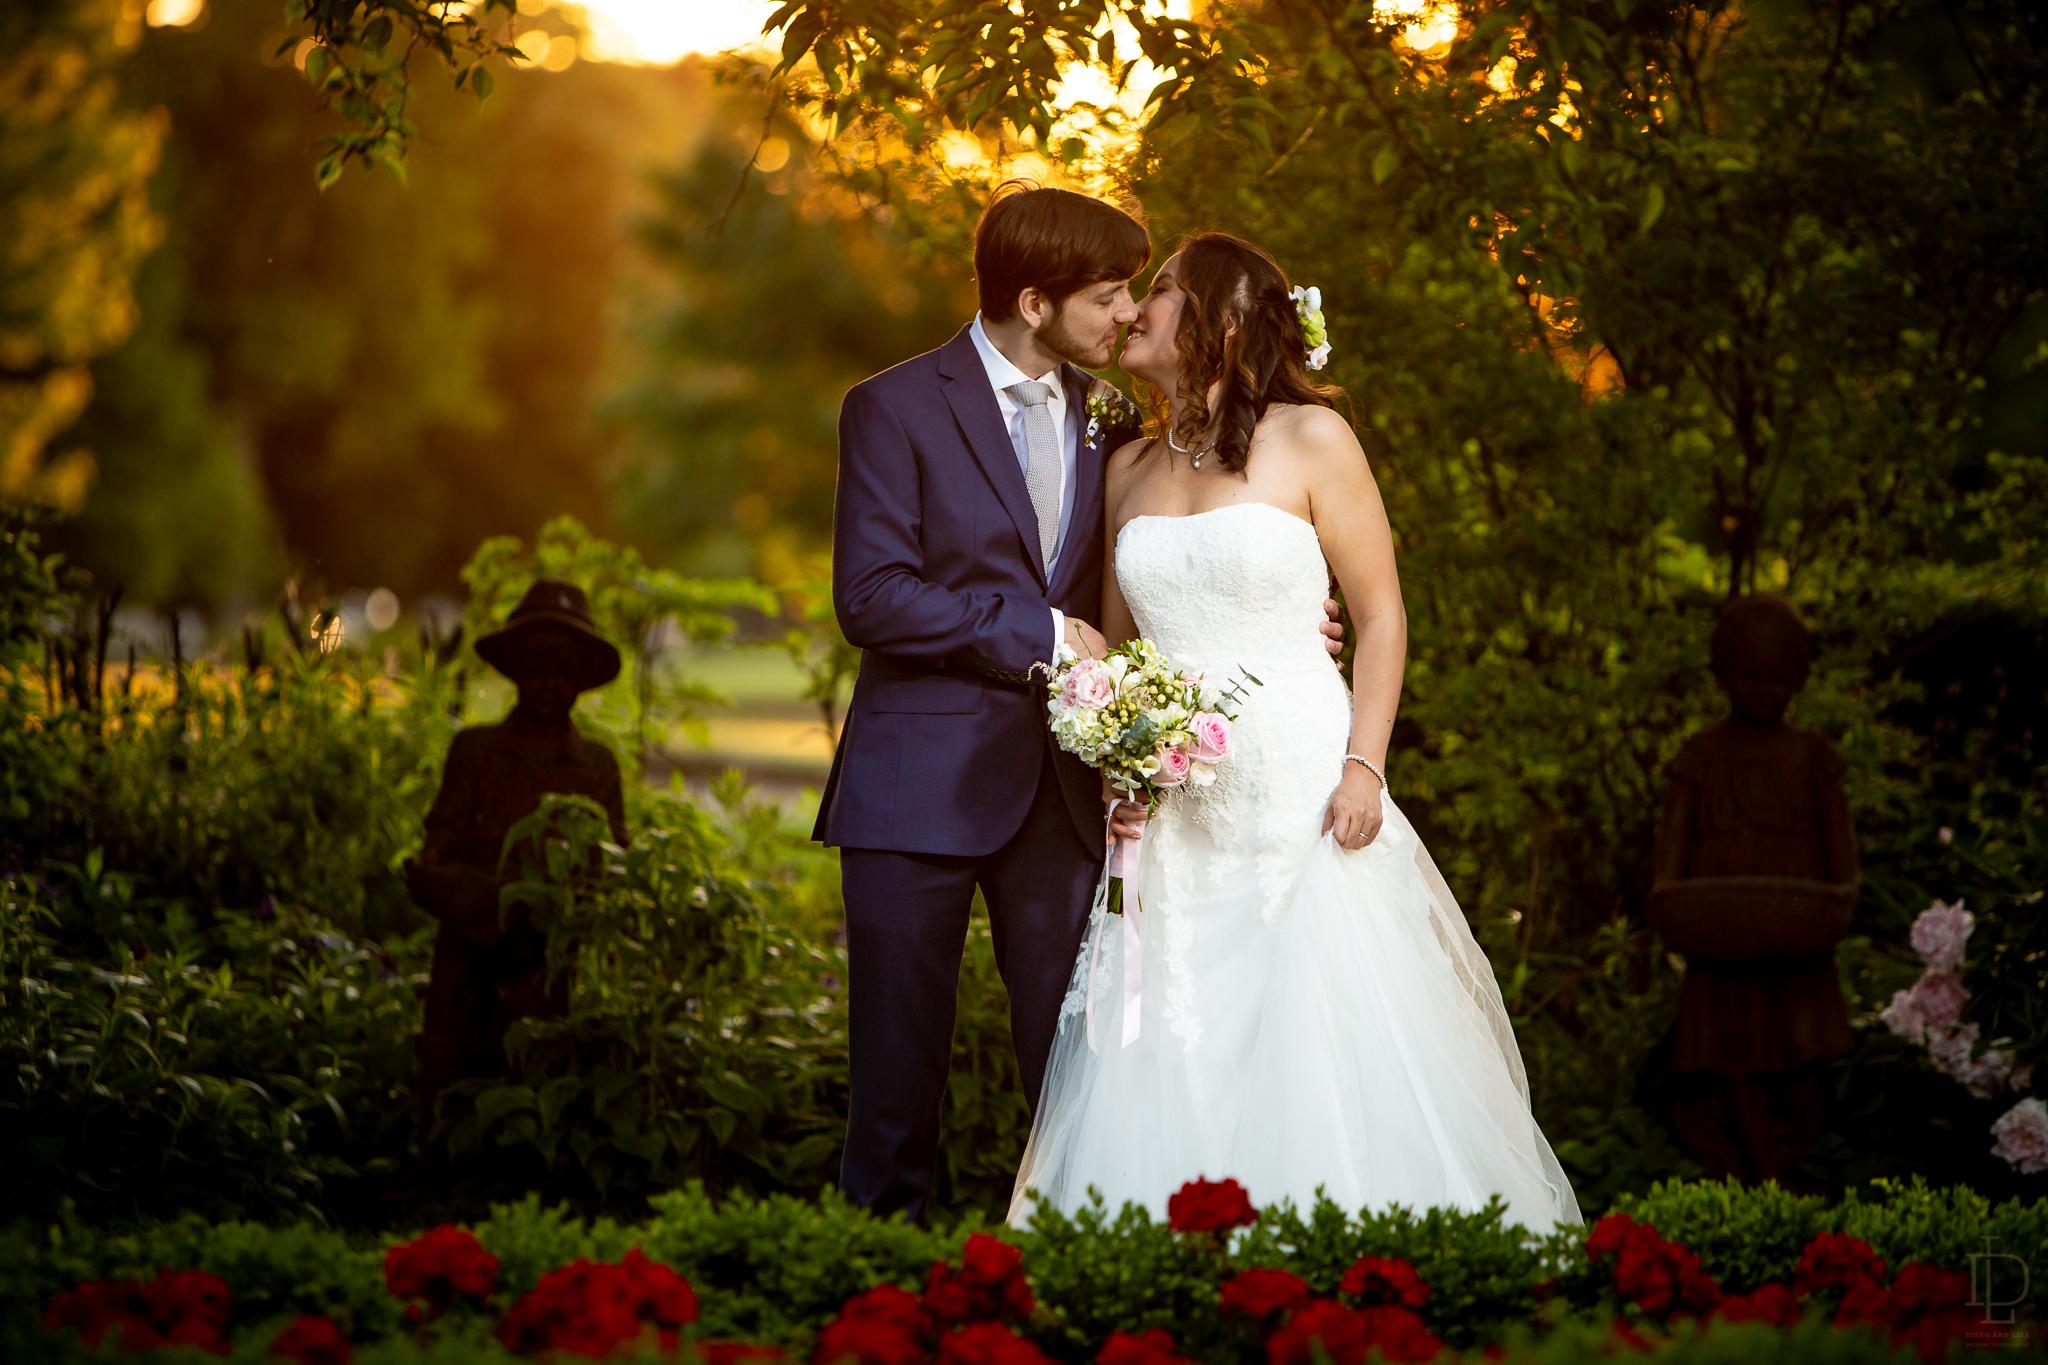 Toronto-wedding-Photograper-53.jpg